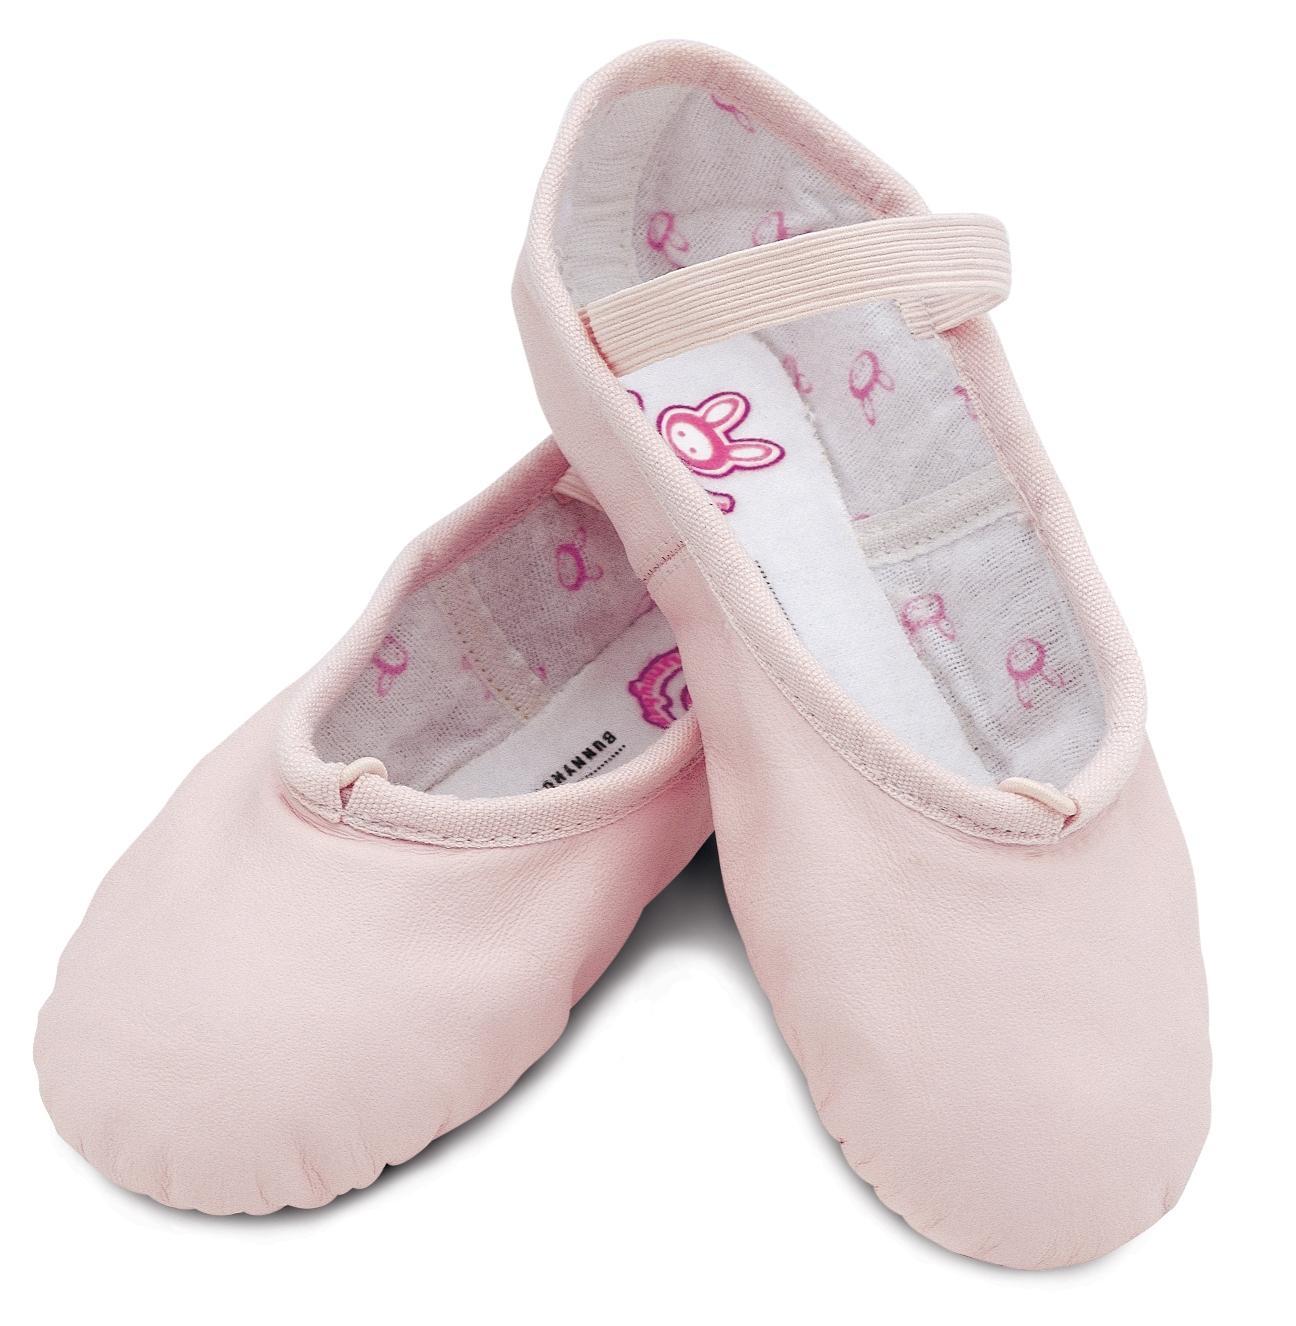 2e20853d0c62 Bloch S0225 Bunnyhop. Introductory ballet ...